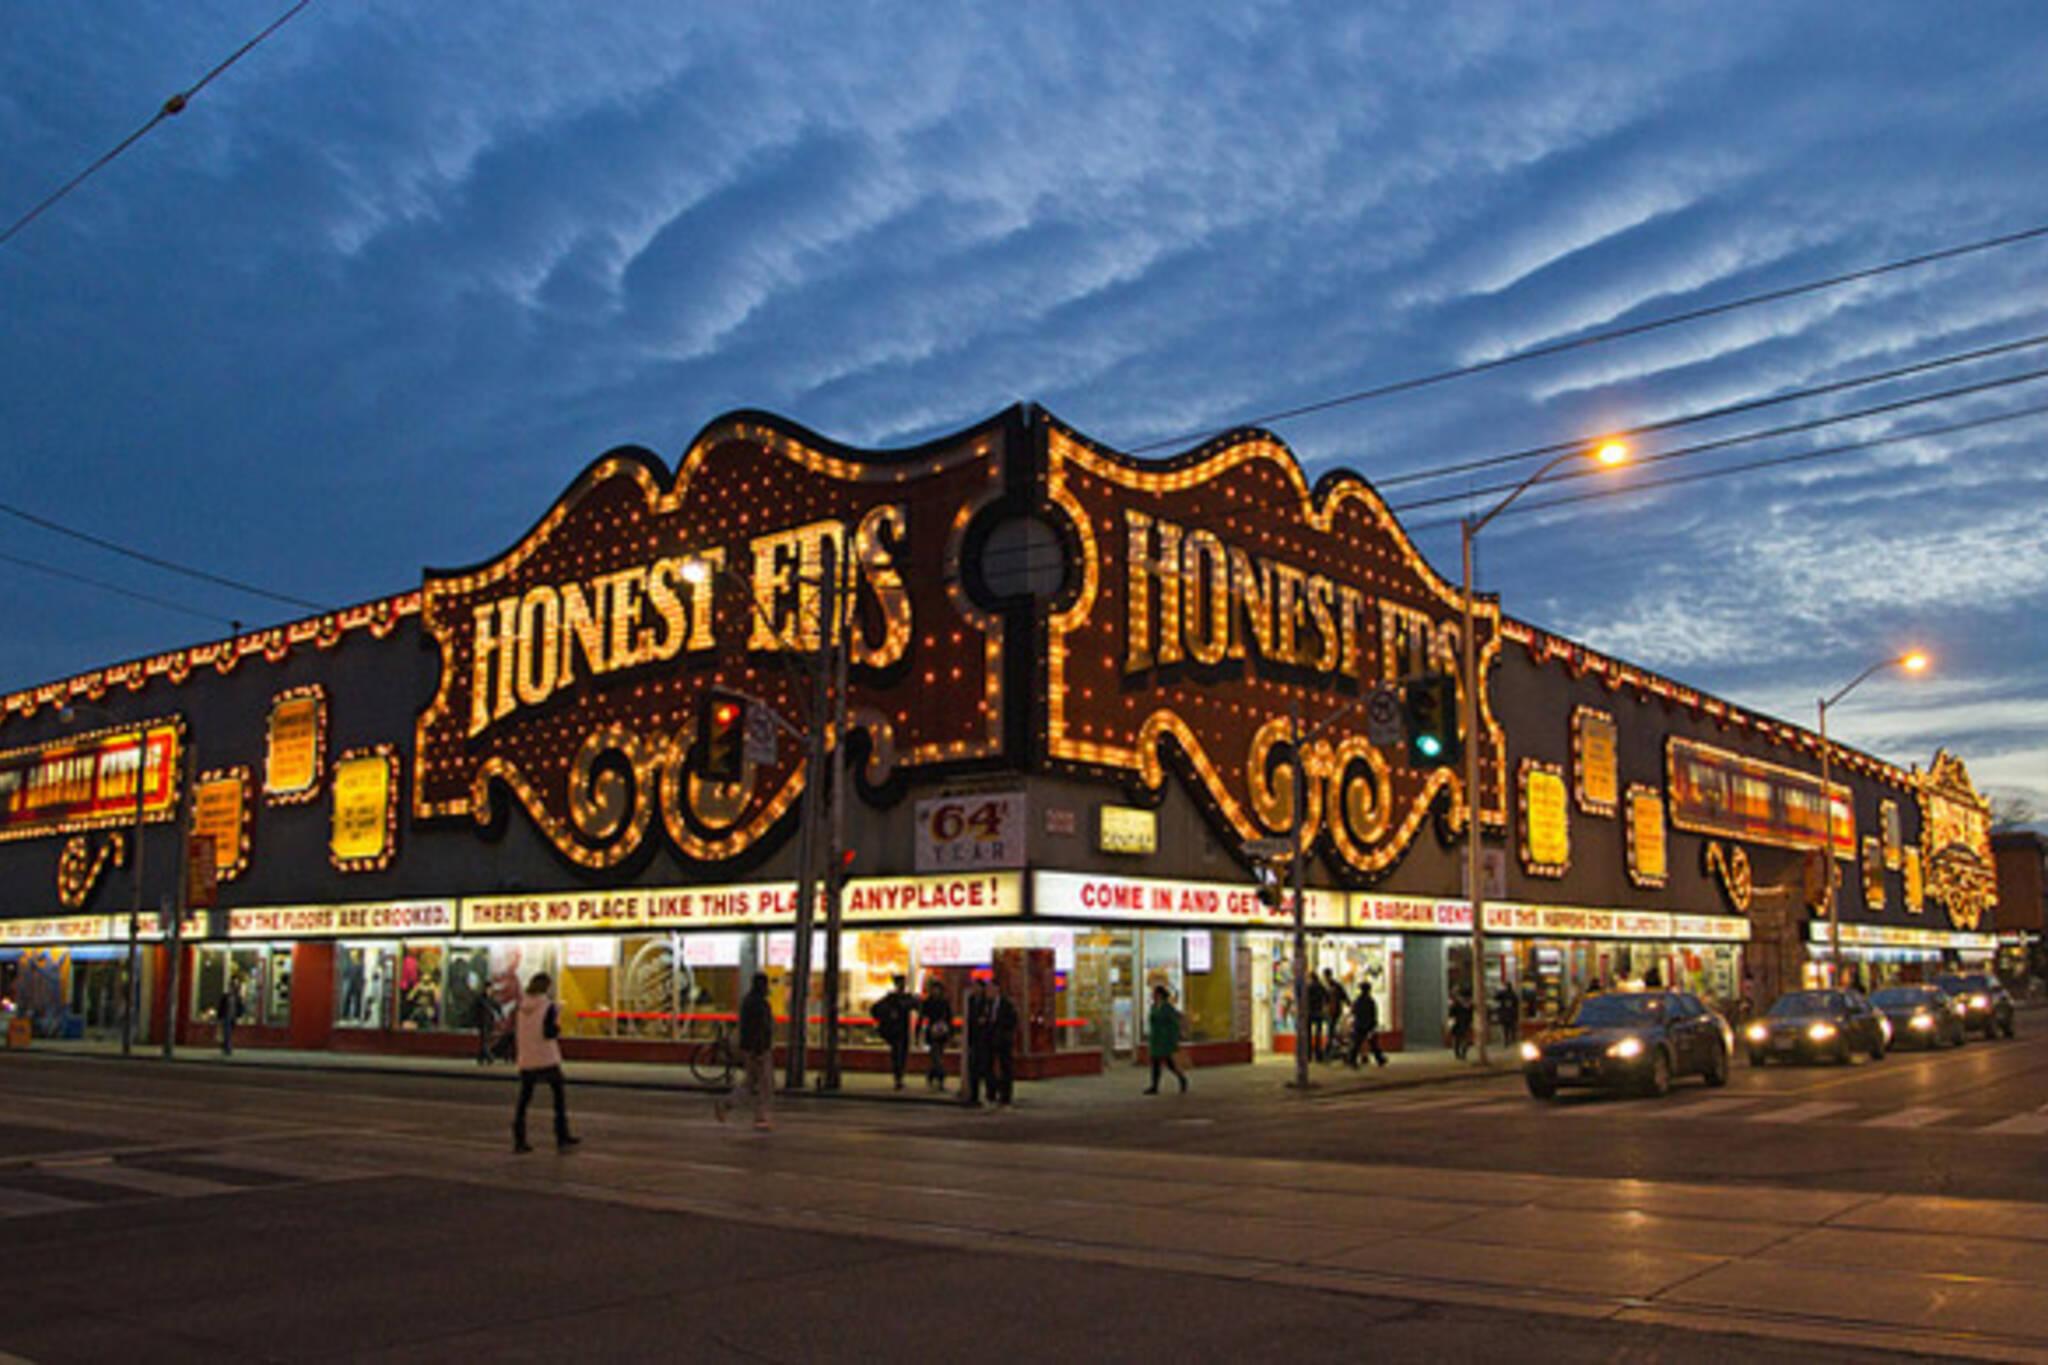 Honest Ed's Toronto